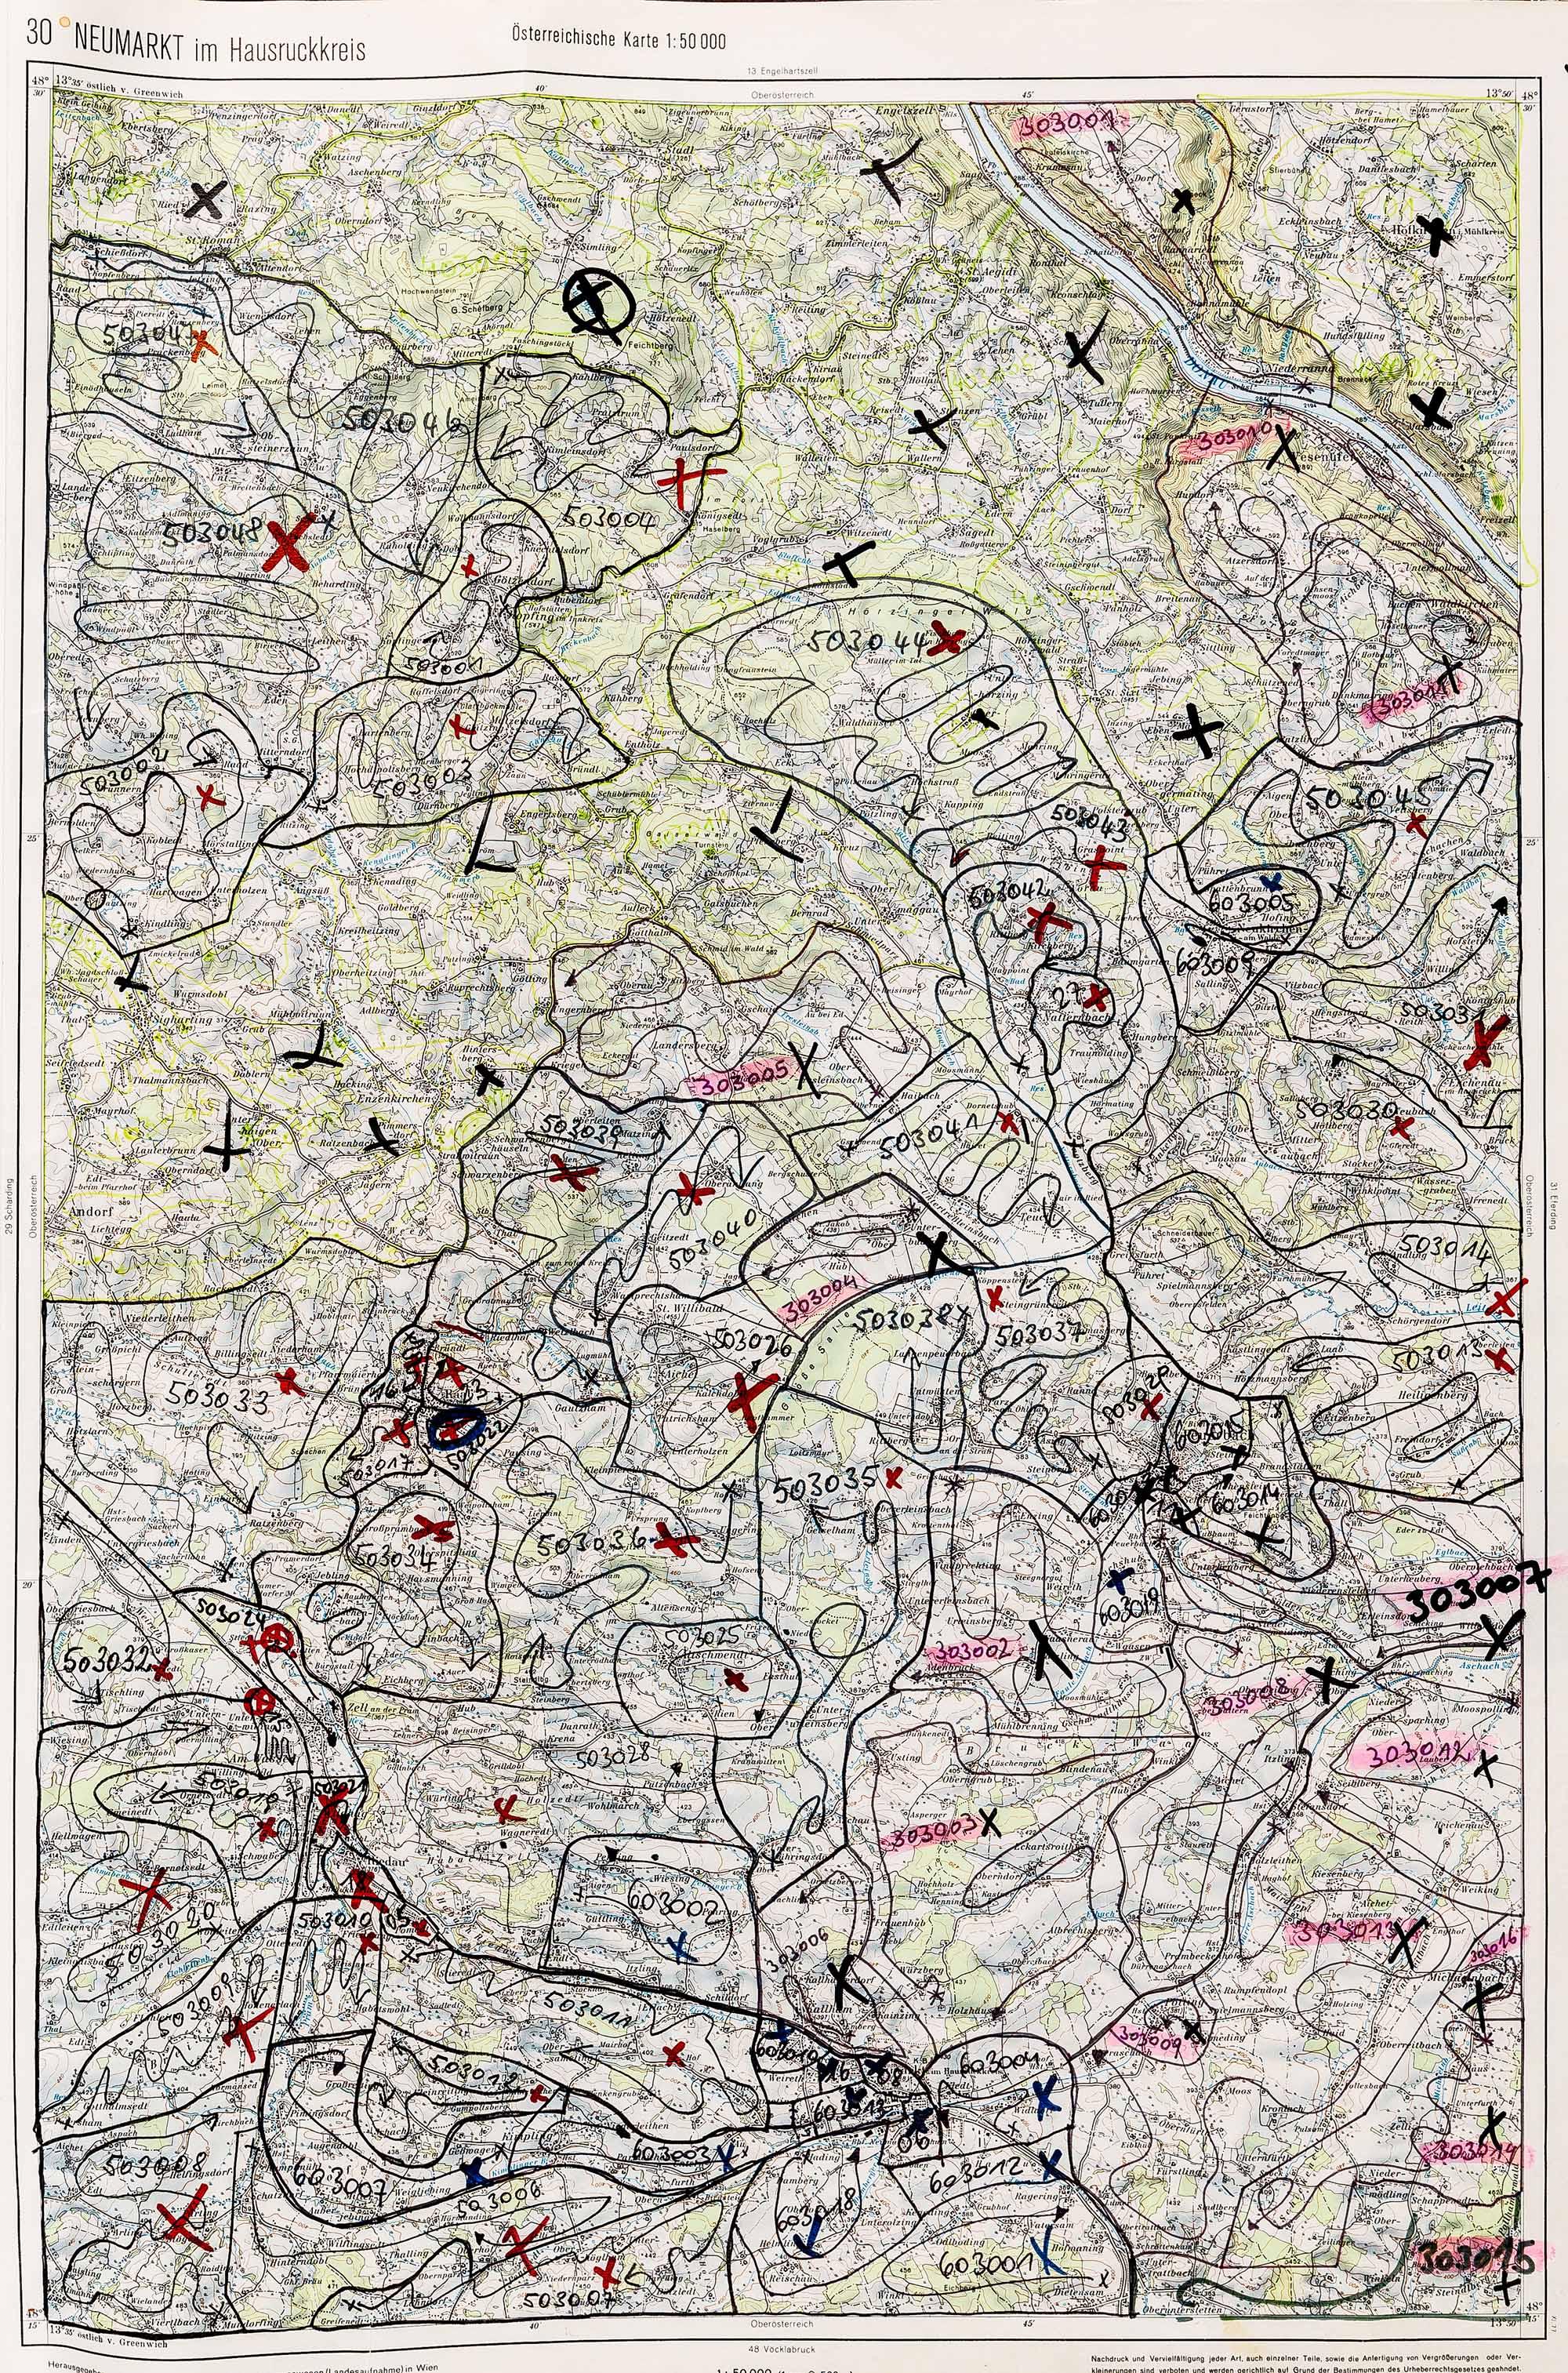 1983-1986 Karte 030